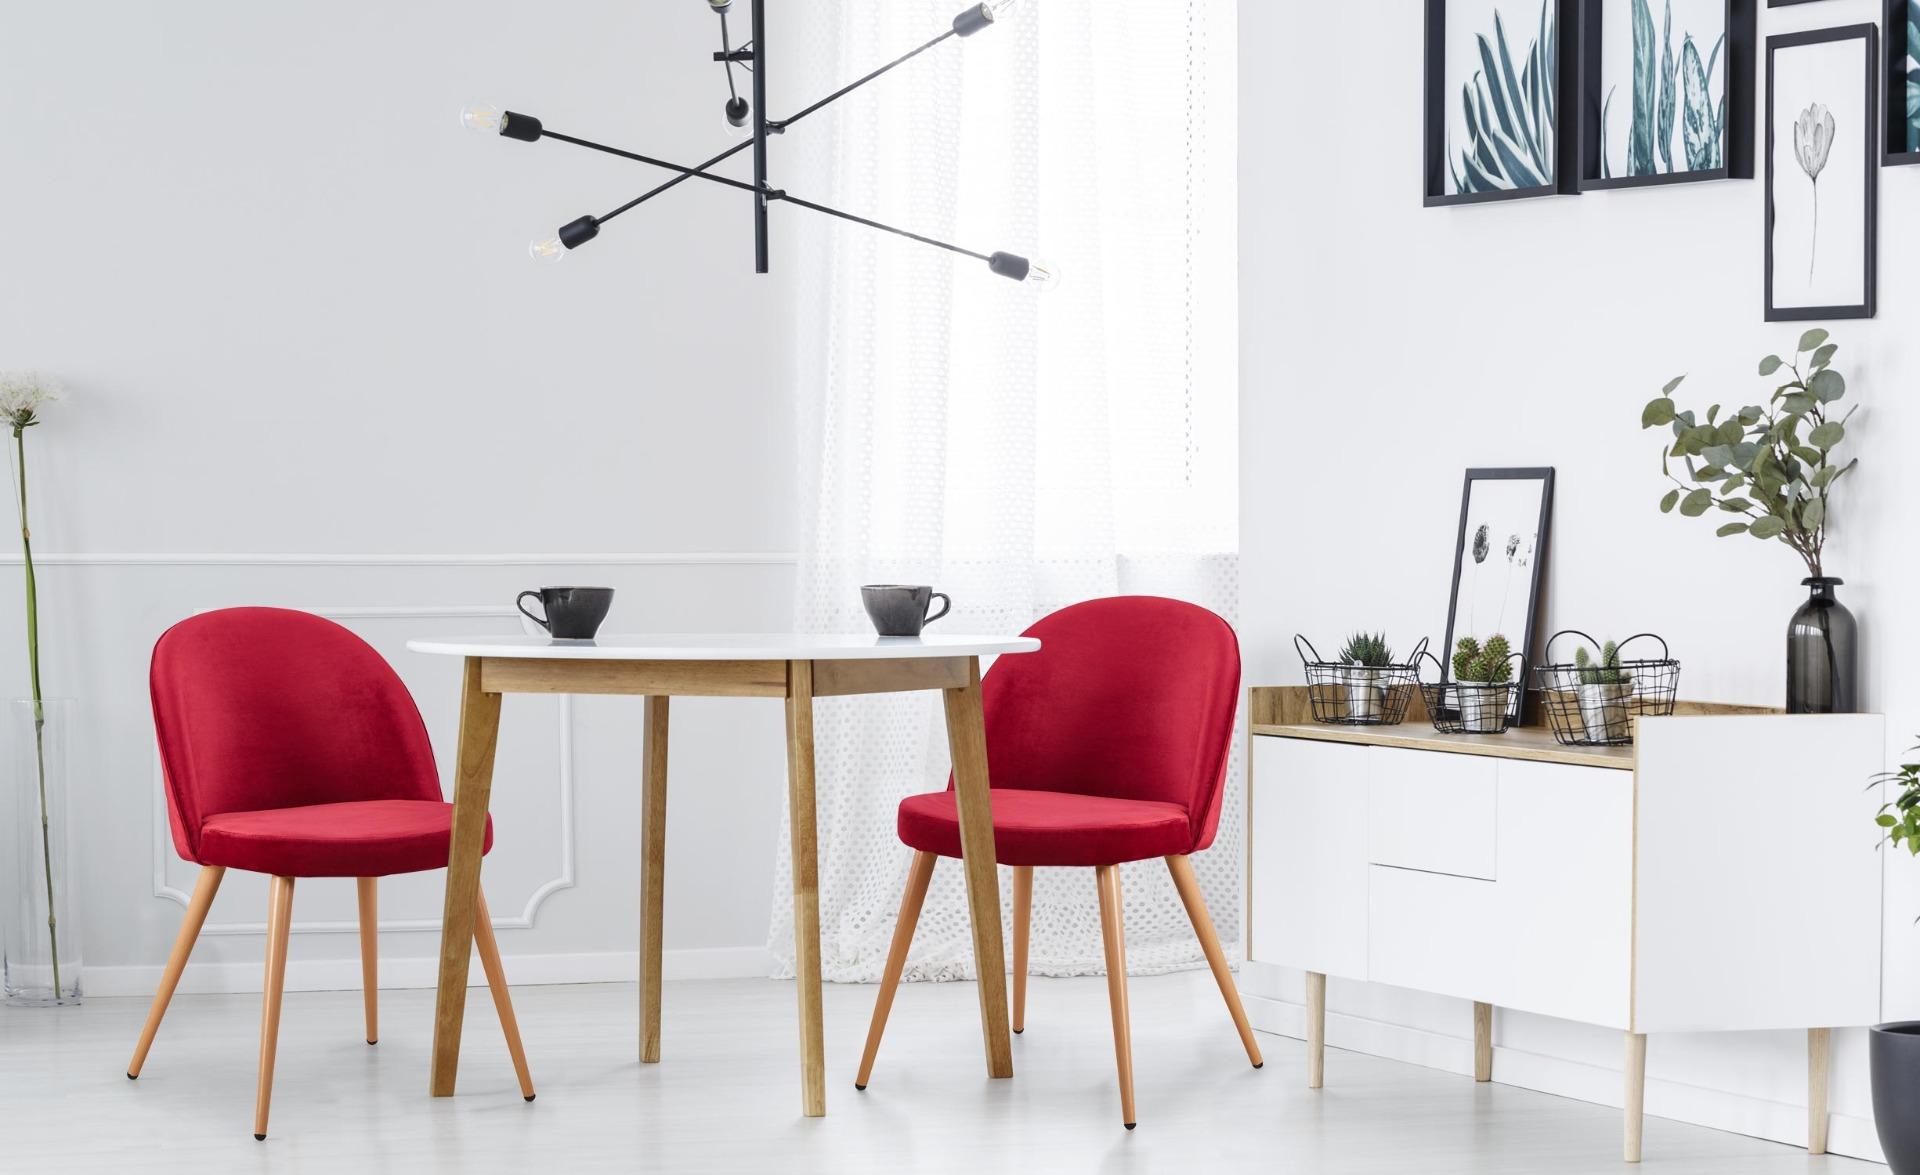 Set di 4 sedie scandinave Tartan in velluto rosso